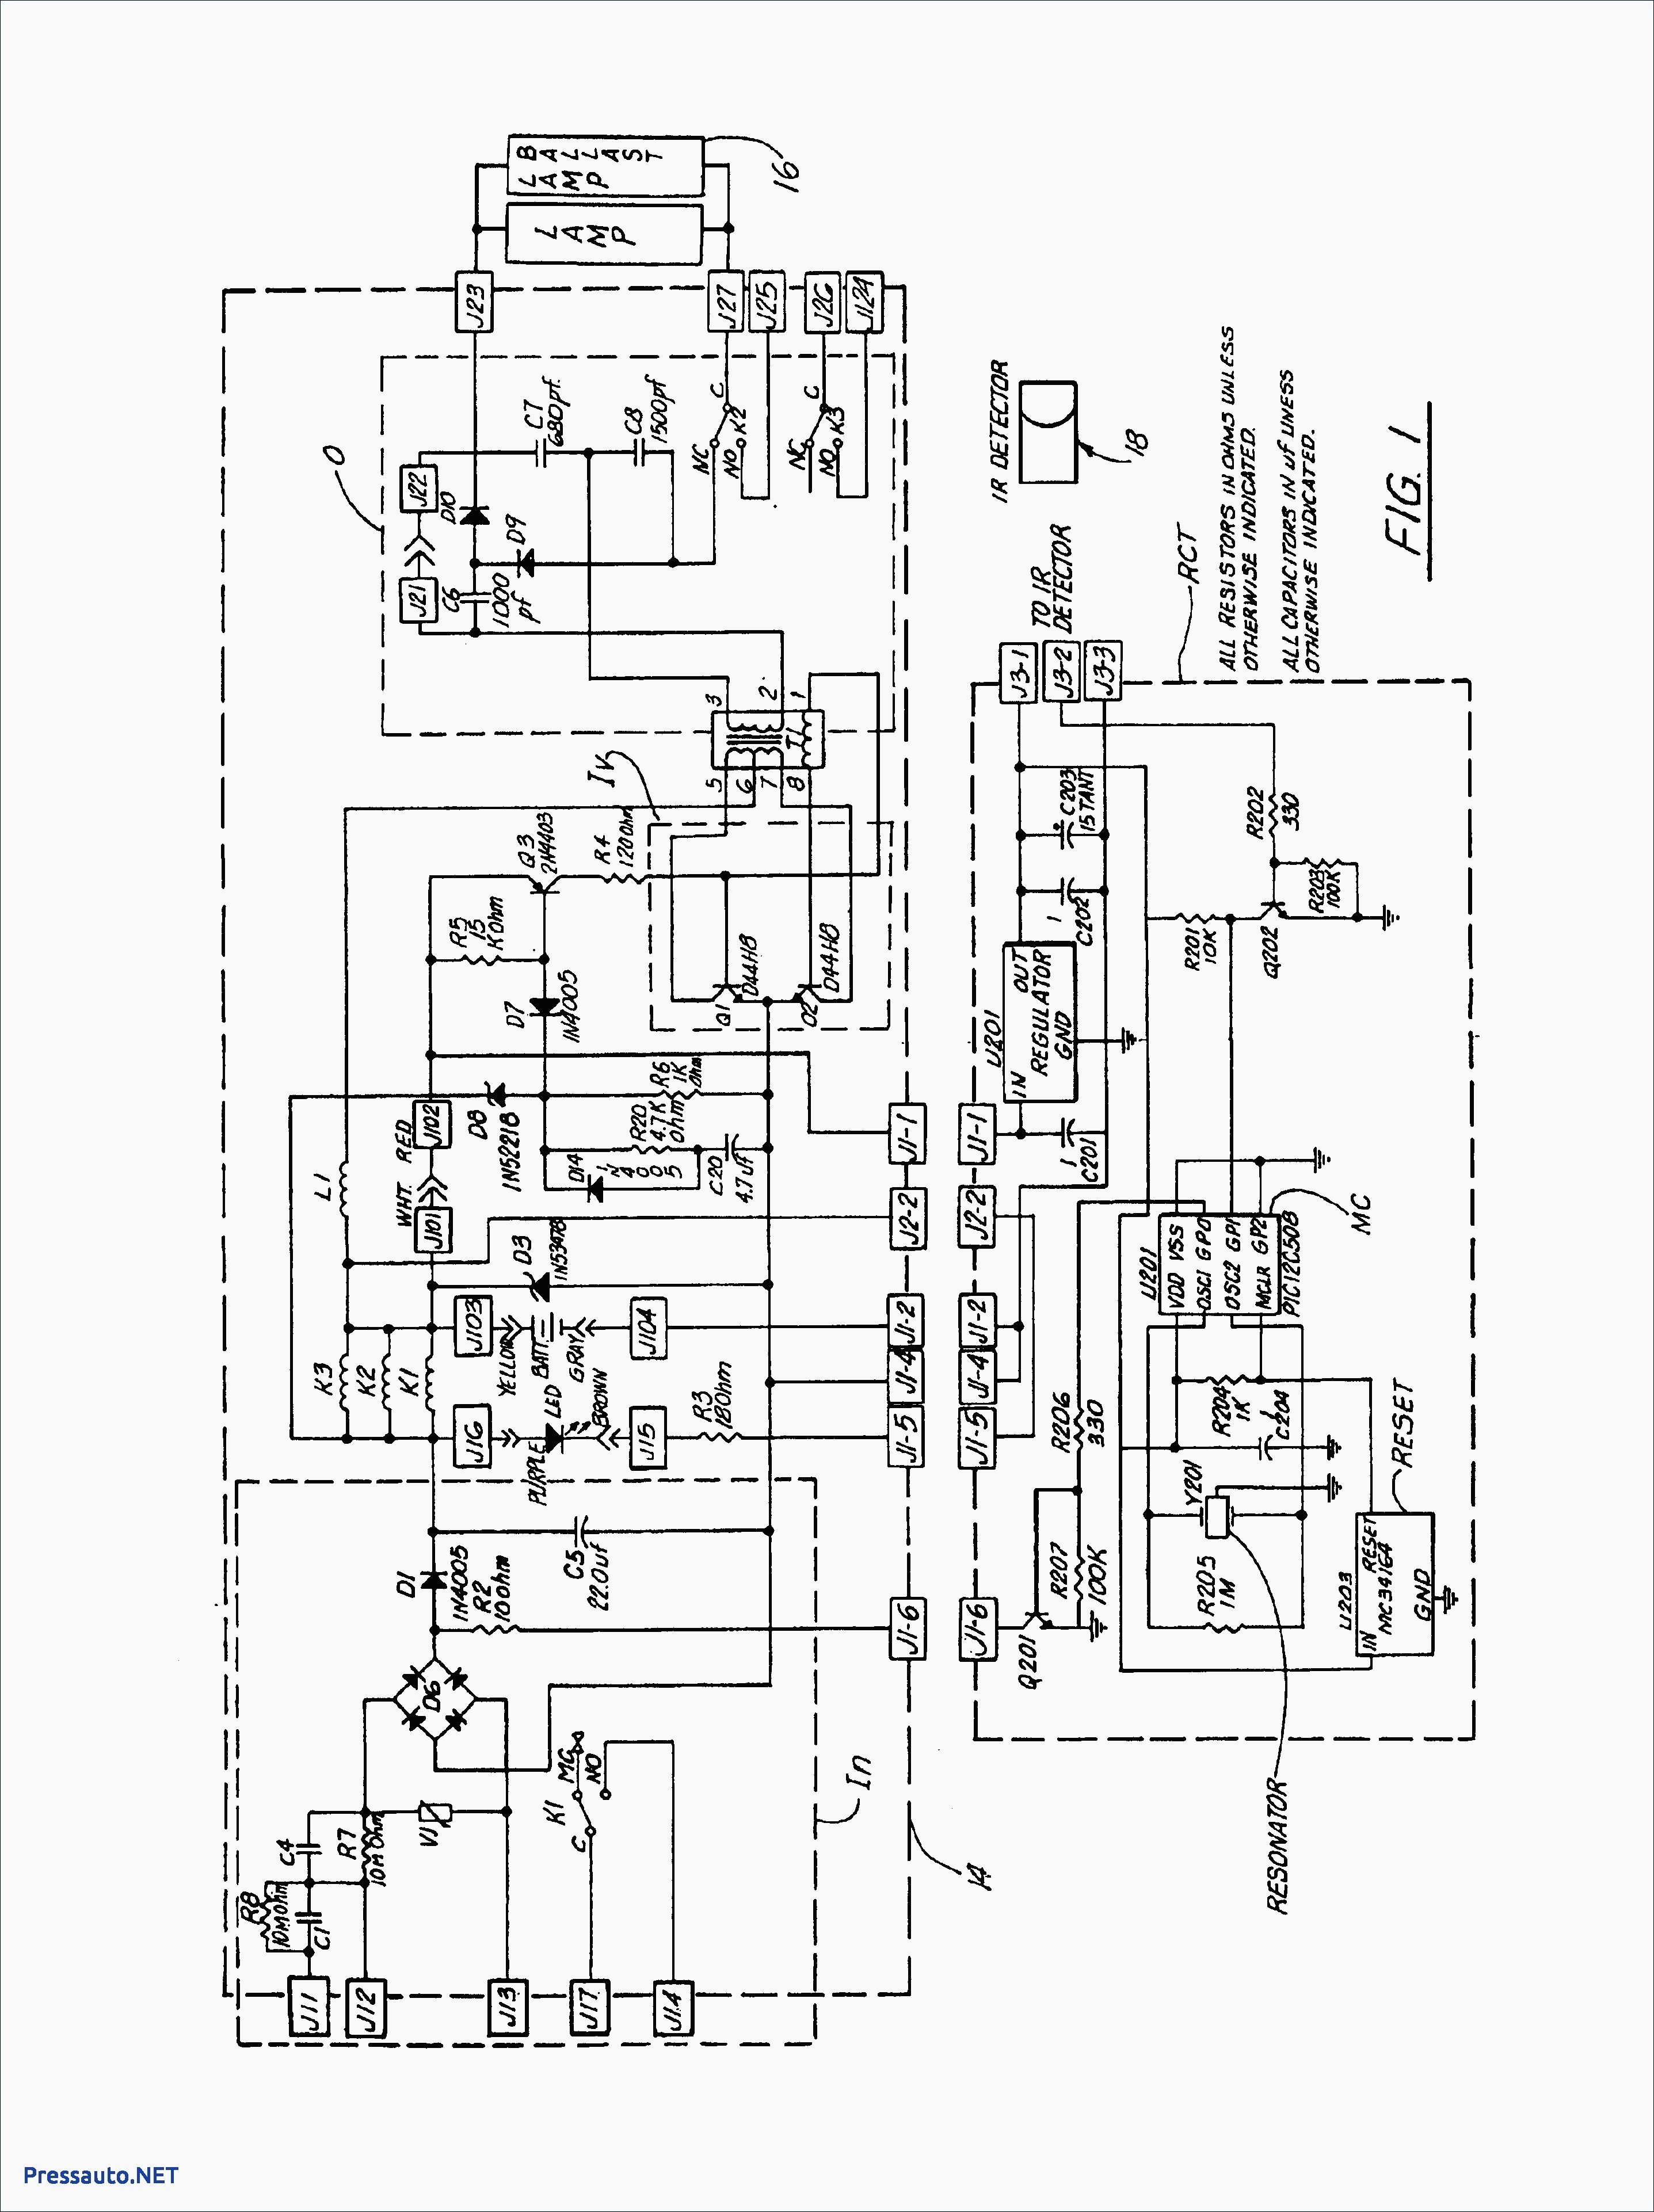 400 Hps Wiring Diagram Easy To Read Wiring Diagrams \u2022 347 Volt Hid  Ballast Wiring Diagram